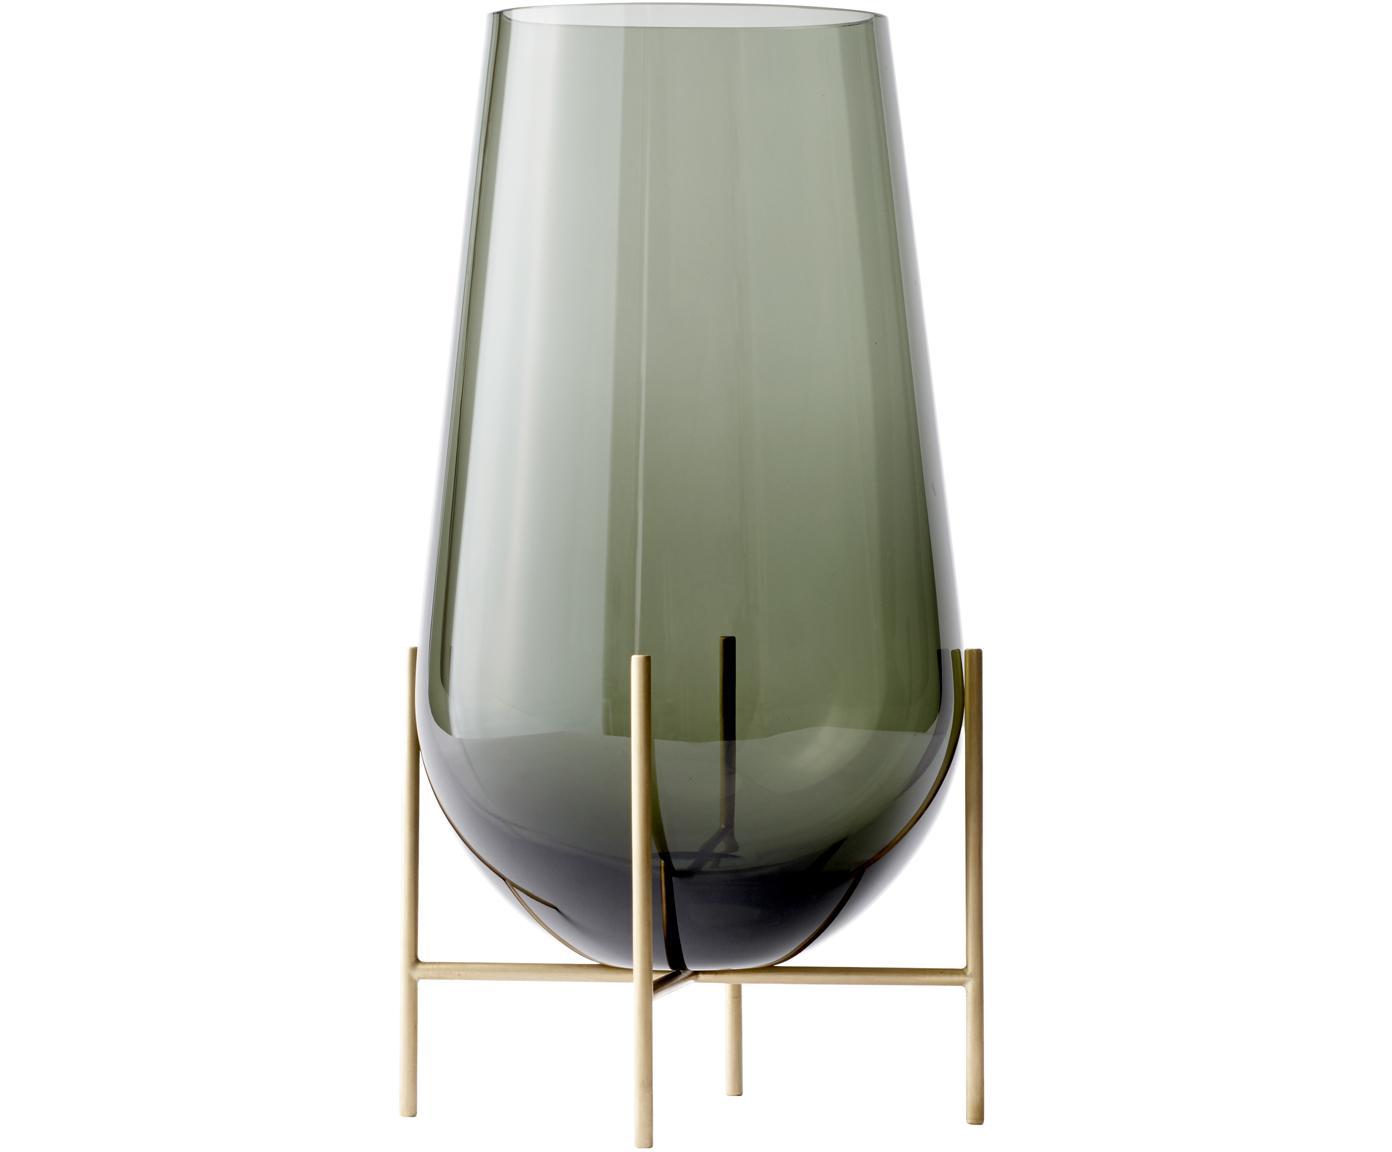 Vaso da terra Échasse, Struttura: ottone, Vaso: vetro soffiato, Ottonato, grigio, Ø 20 x Alt. 60 cm